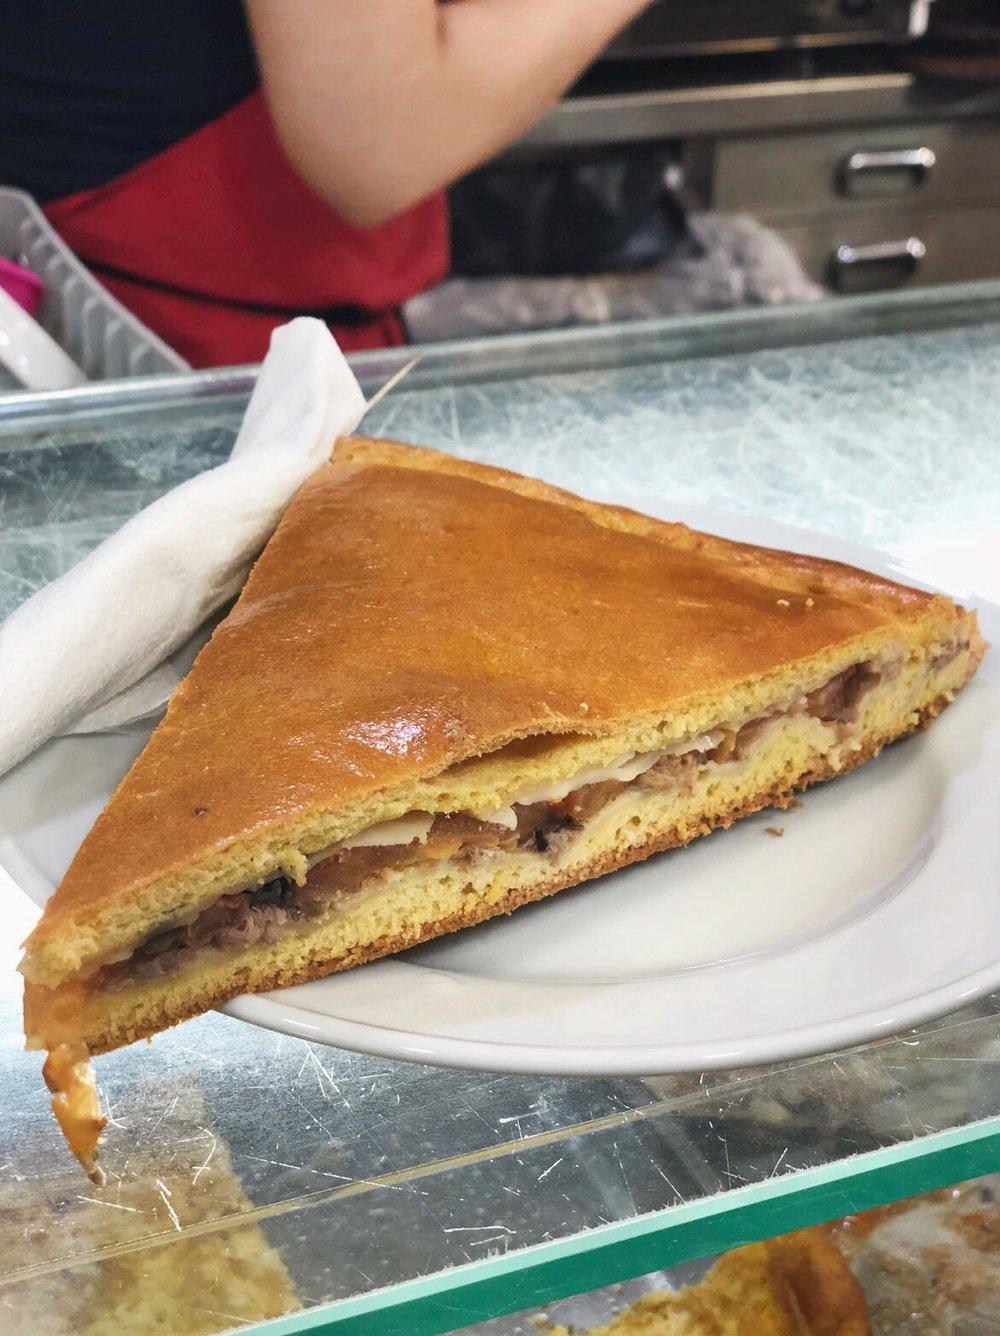 24hourkitchen-travel-guide-to-portuguese-pastries-pastelaria-lisbon-portugal-pastelao-de-atum